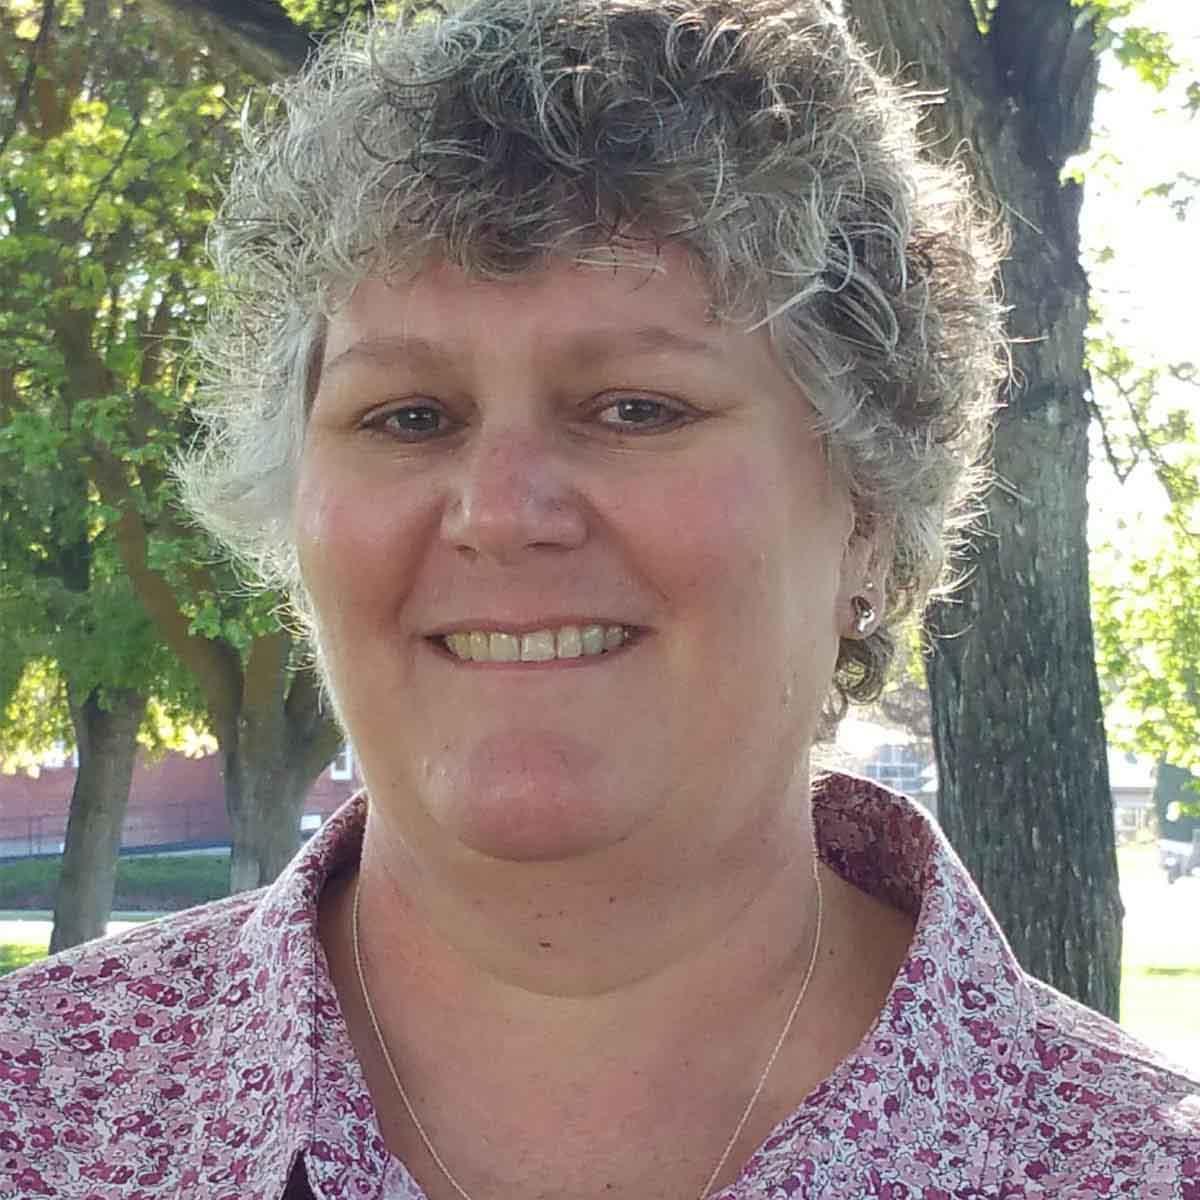 Forum on this topic: Laura Bell Bundy, karen-mcdougal-united-states/